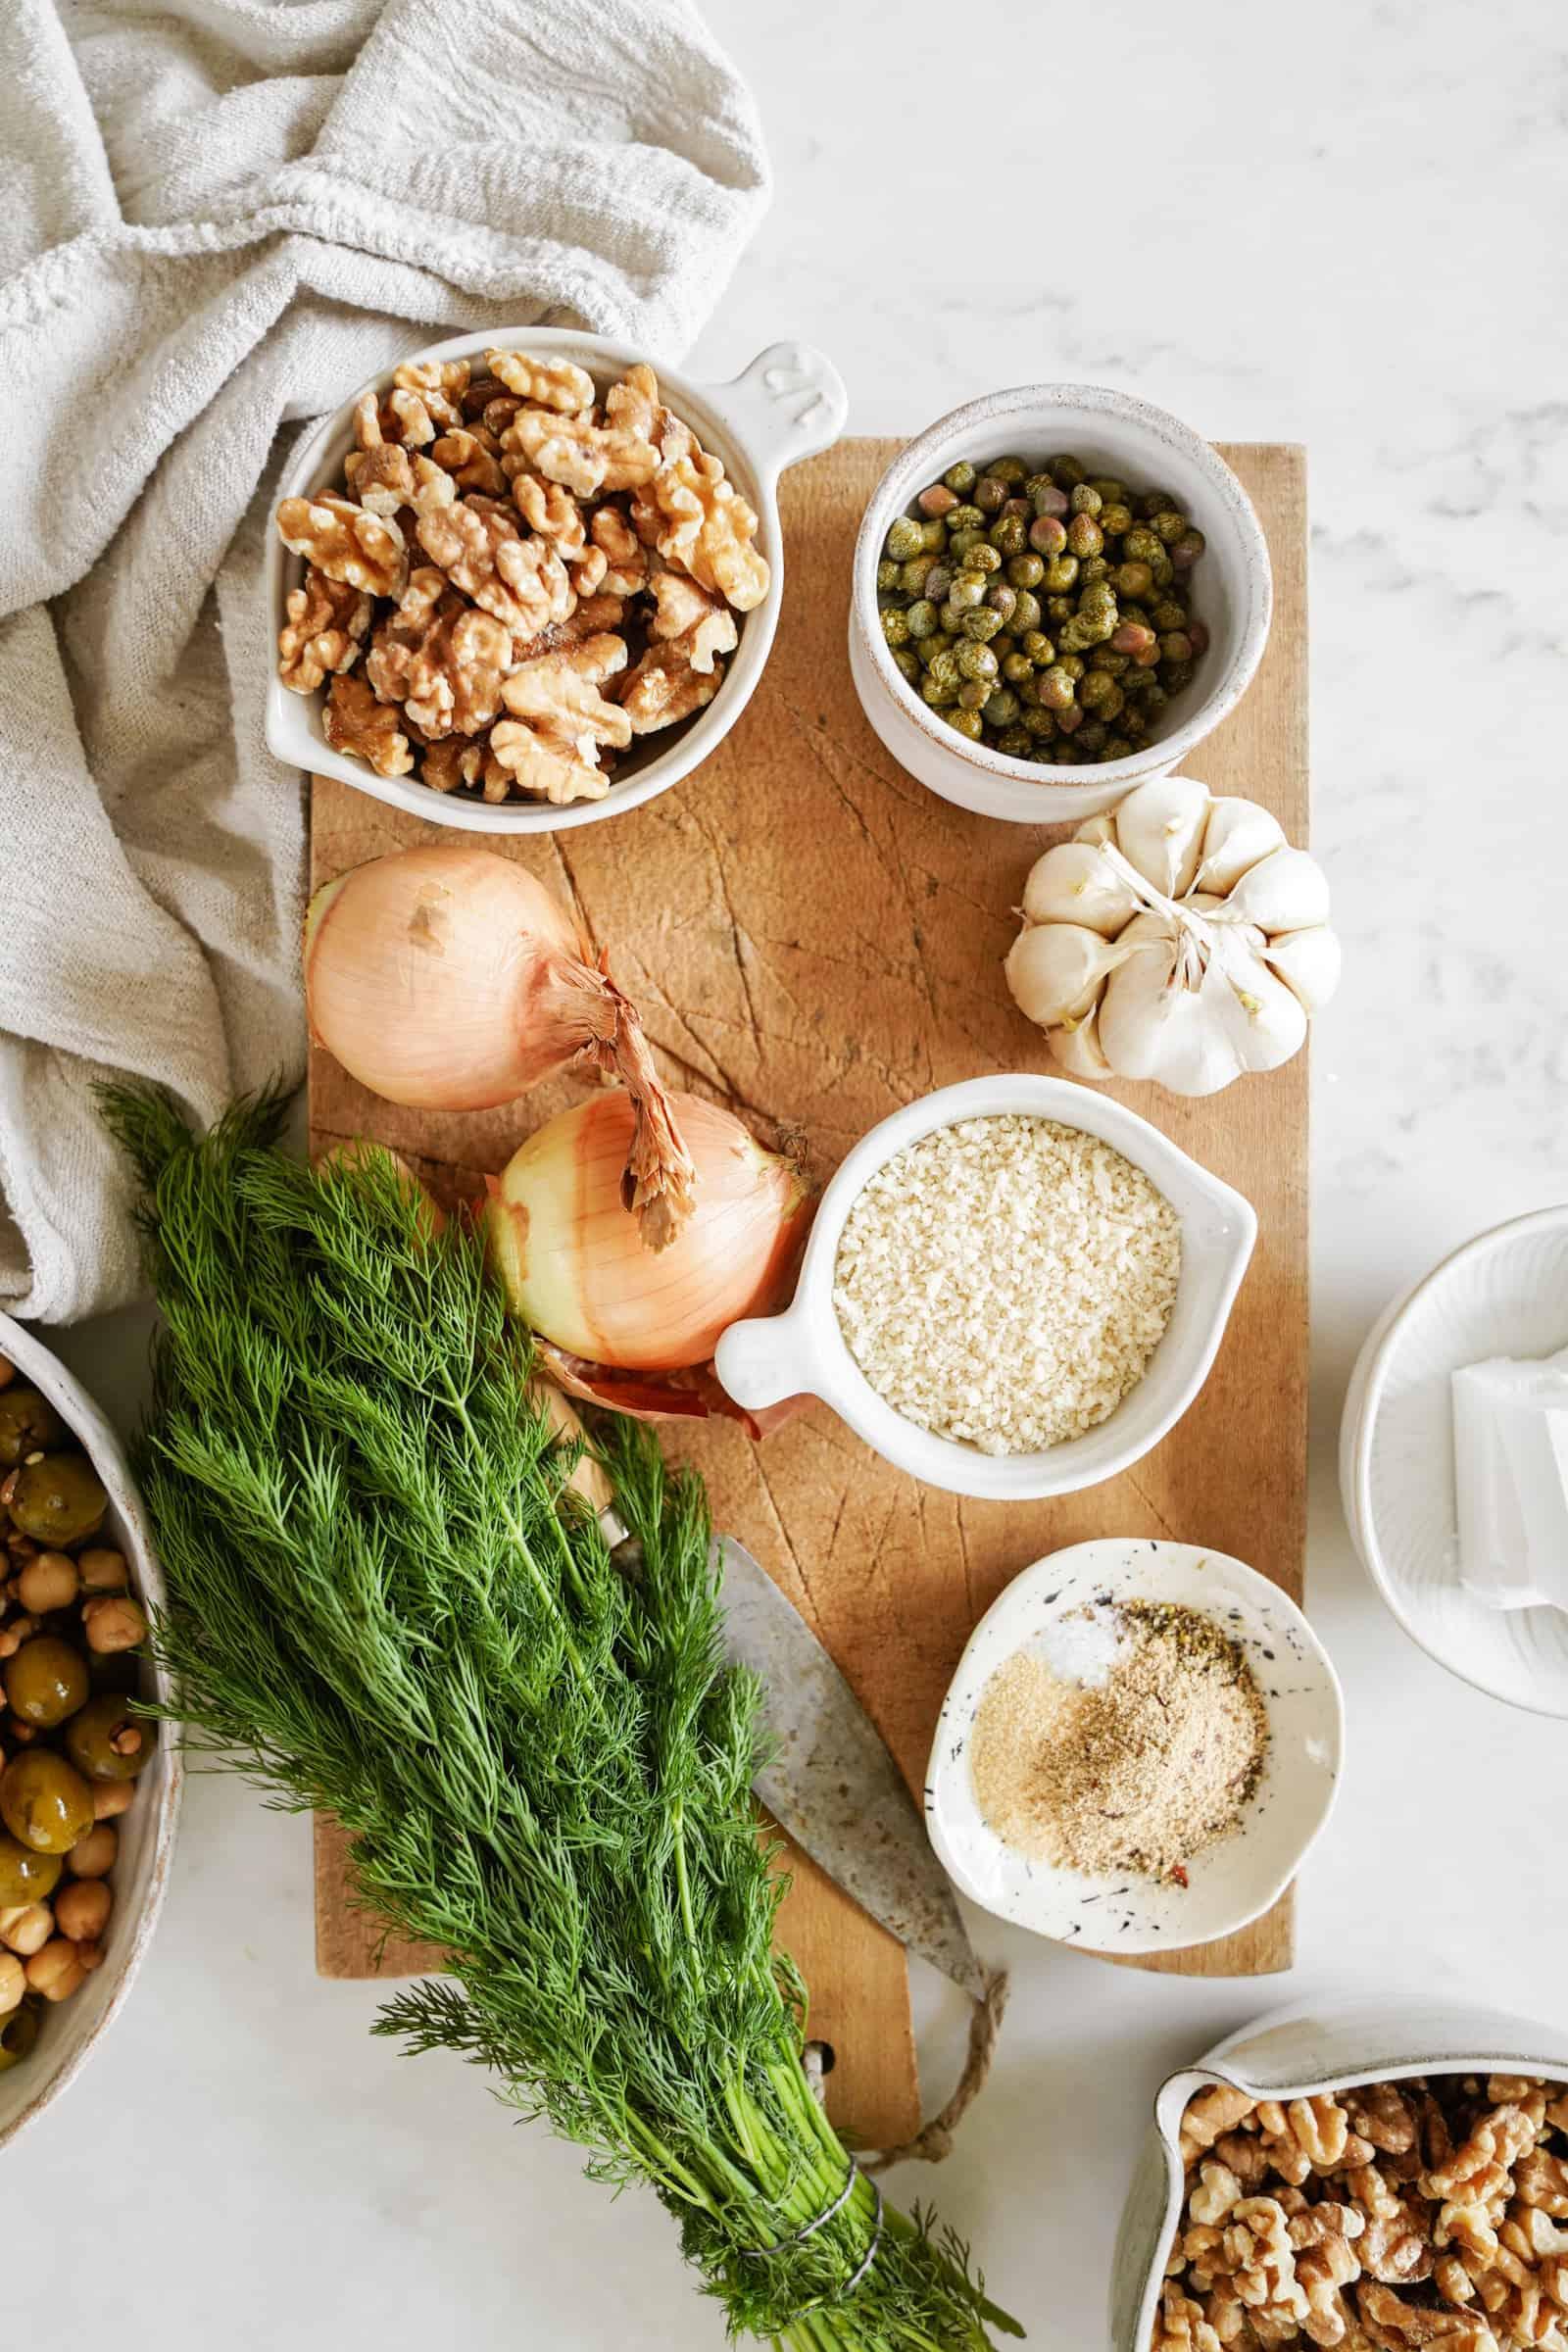 Ingredients for walnut meatballs